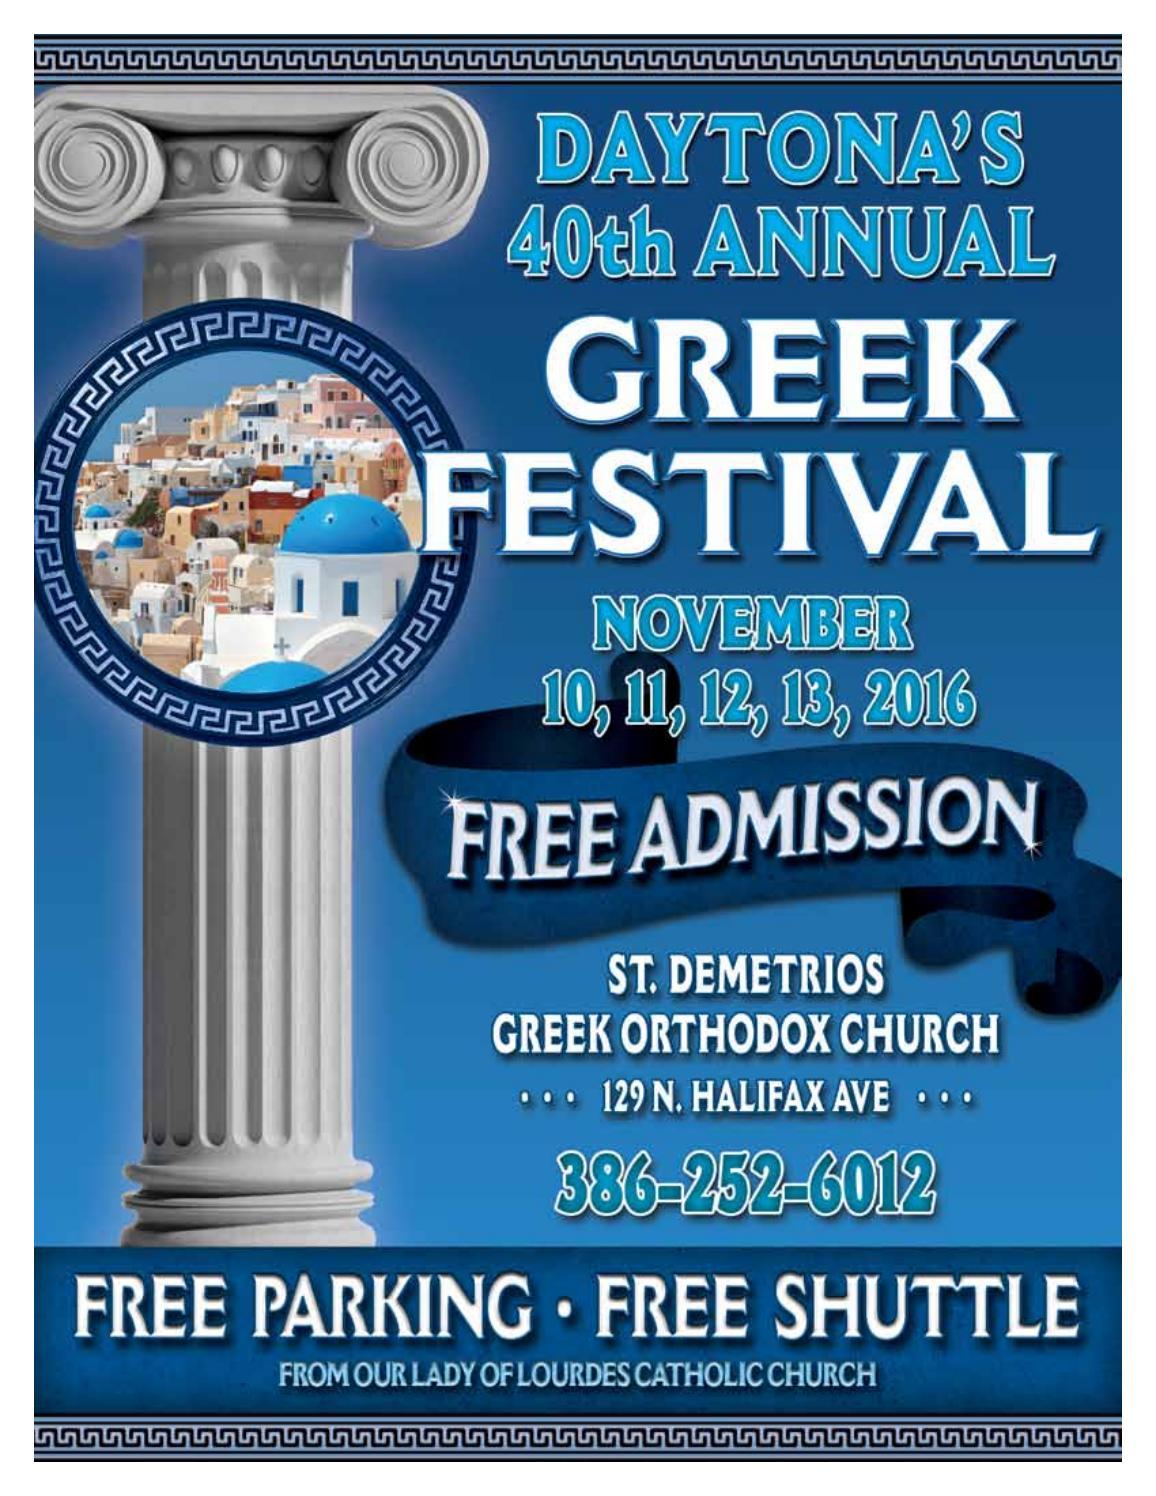 greek festival daytona beach